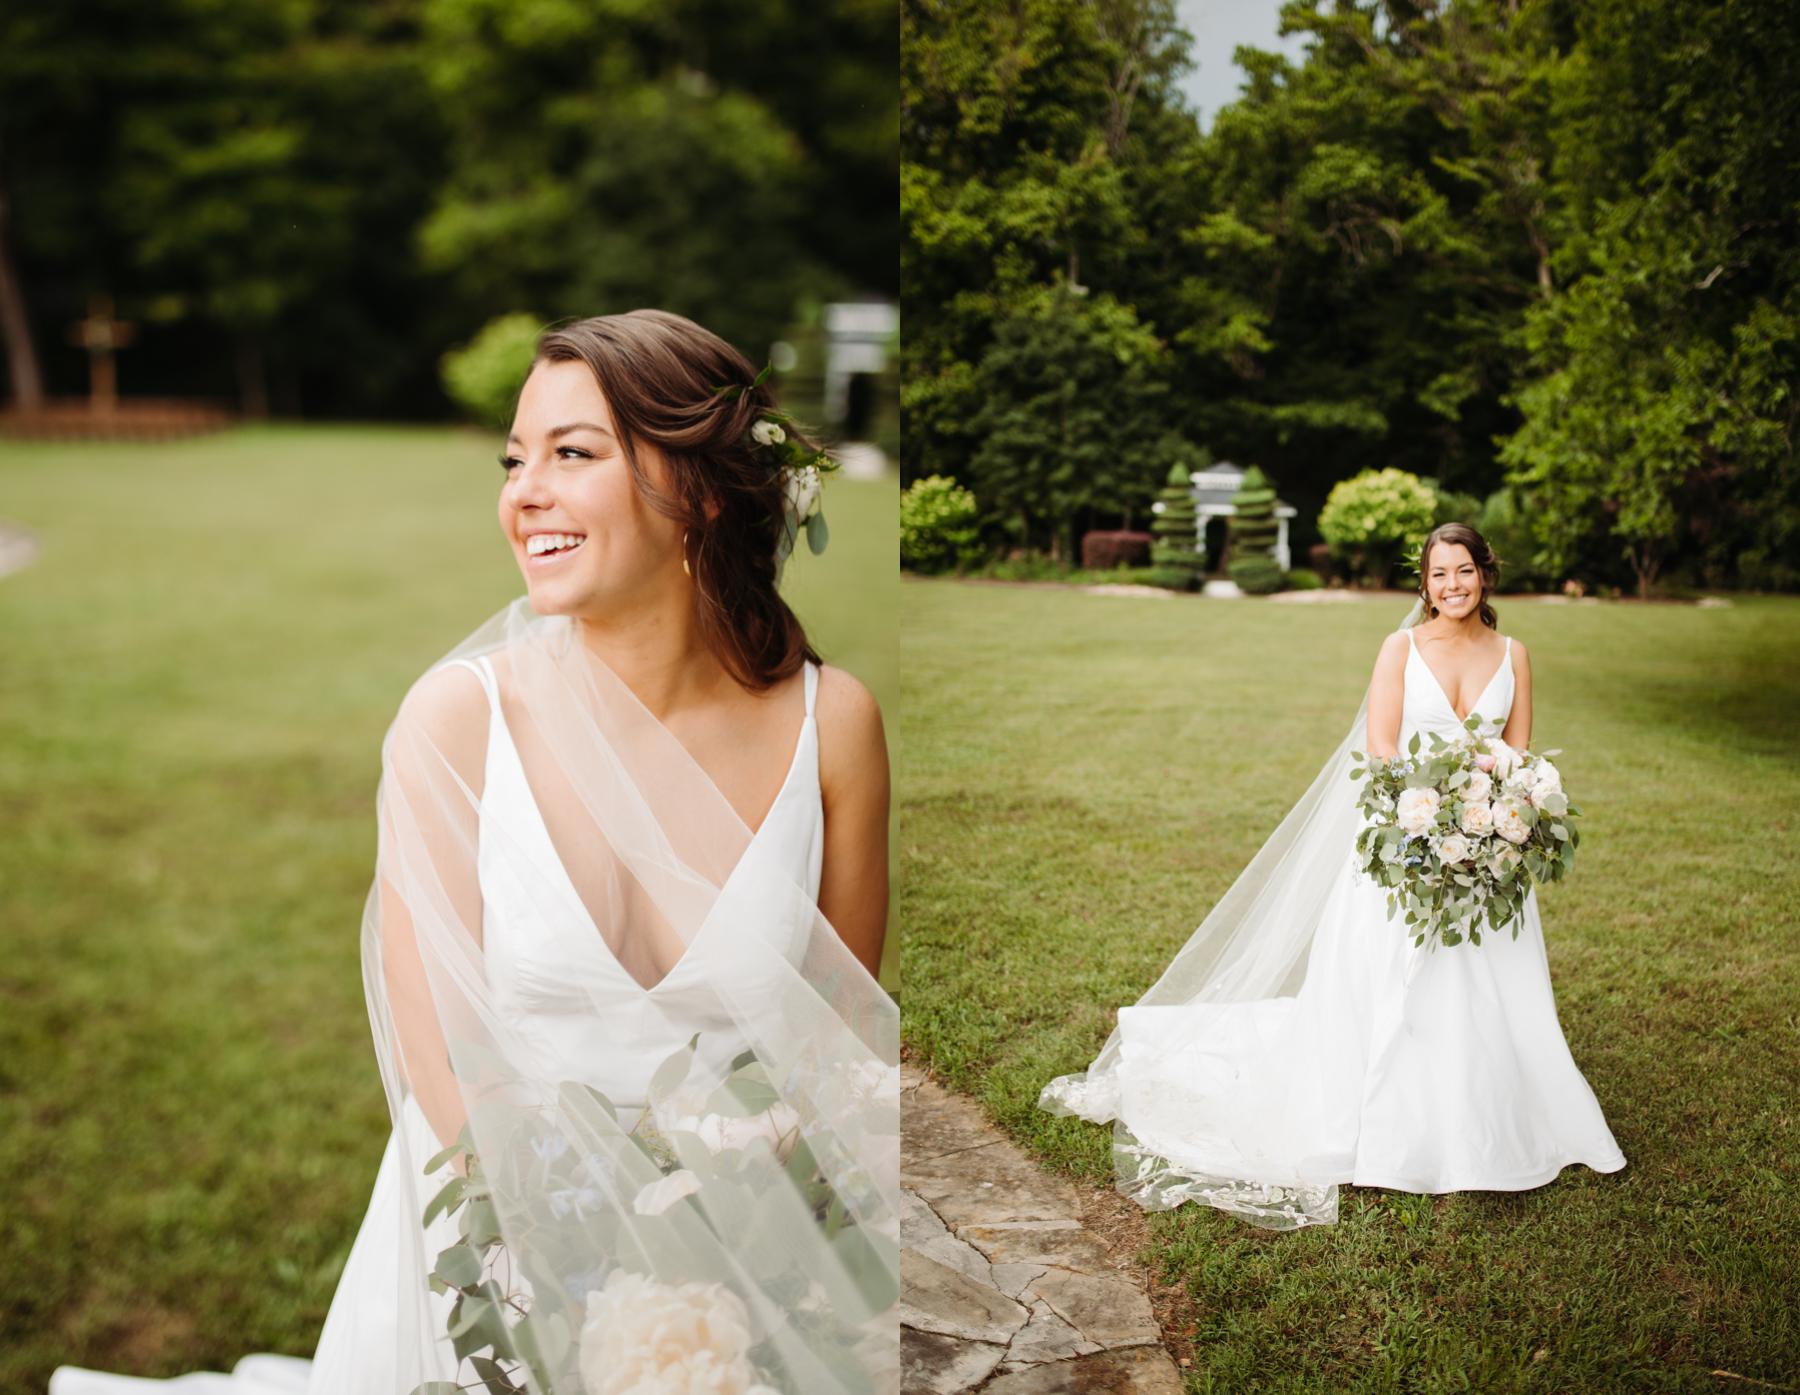 daras-garden-wedding-5.jpg